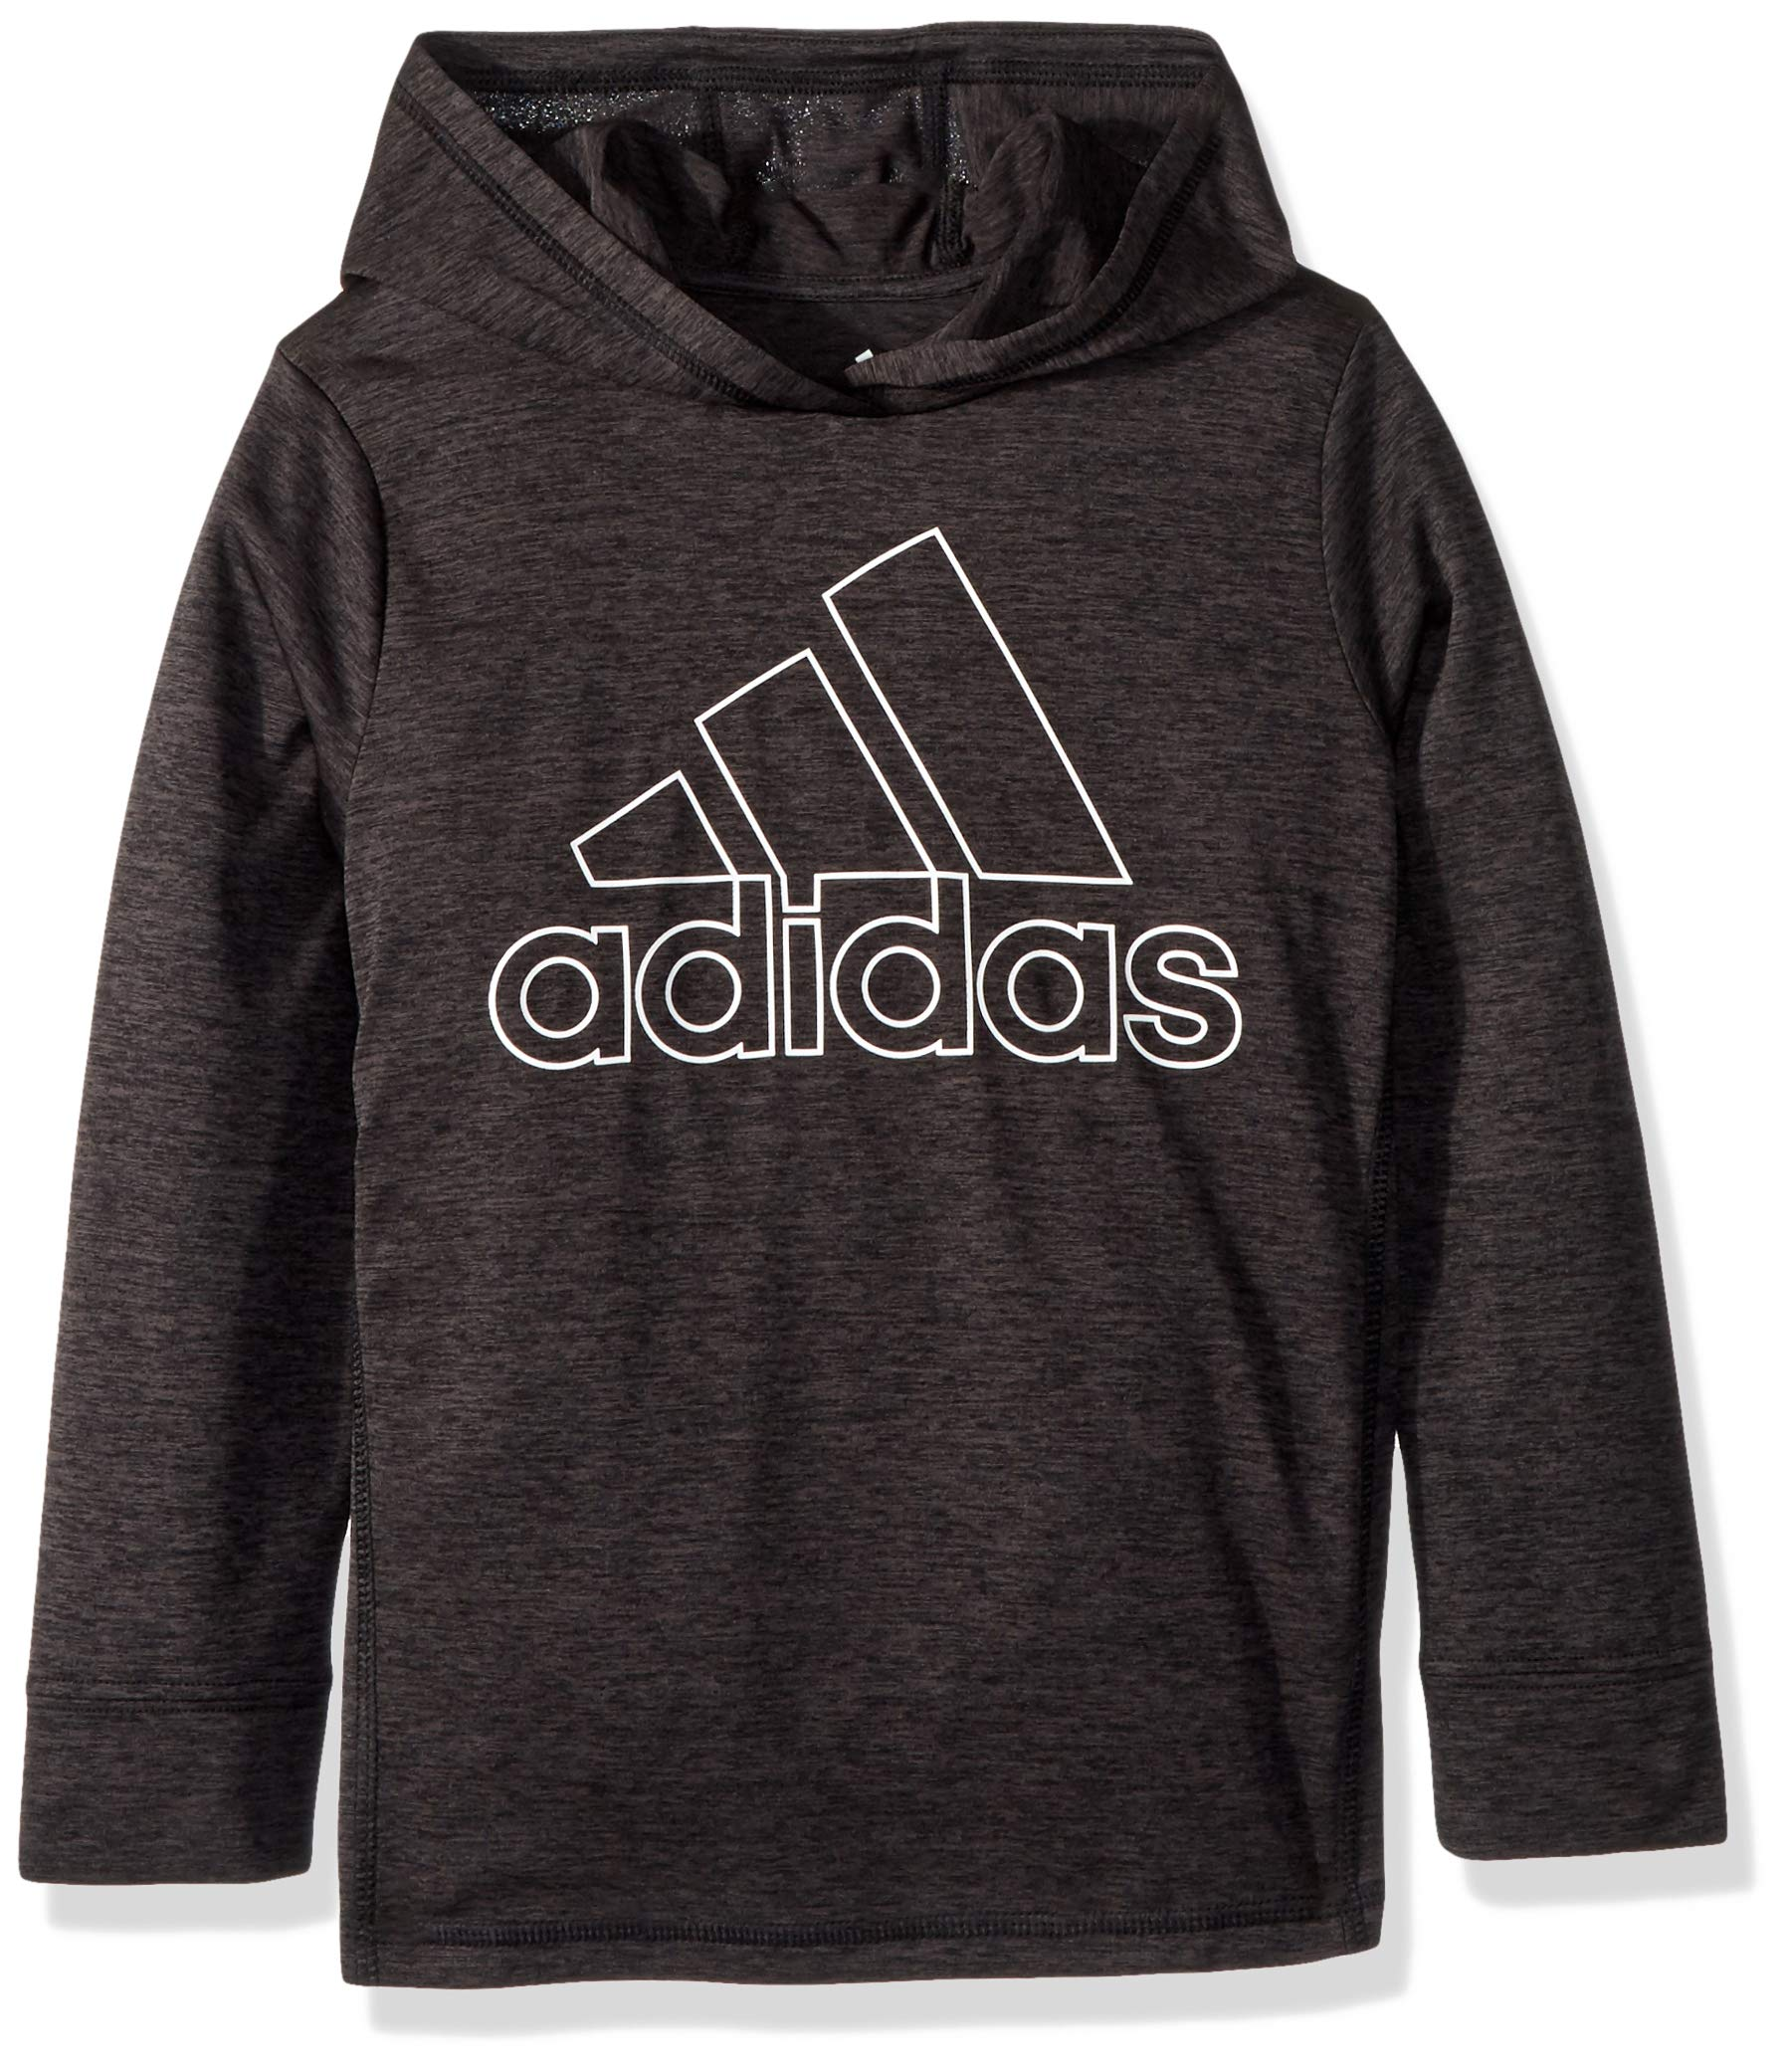 adidas Big Boys' Athletic Pullover Hoodie, Black Heather, XL(18/20)